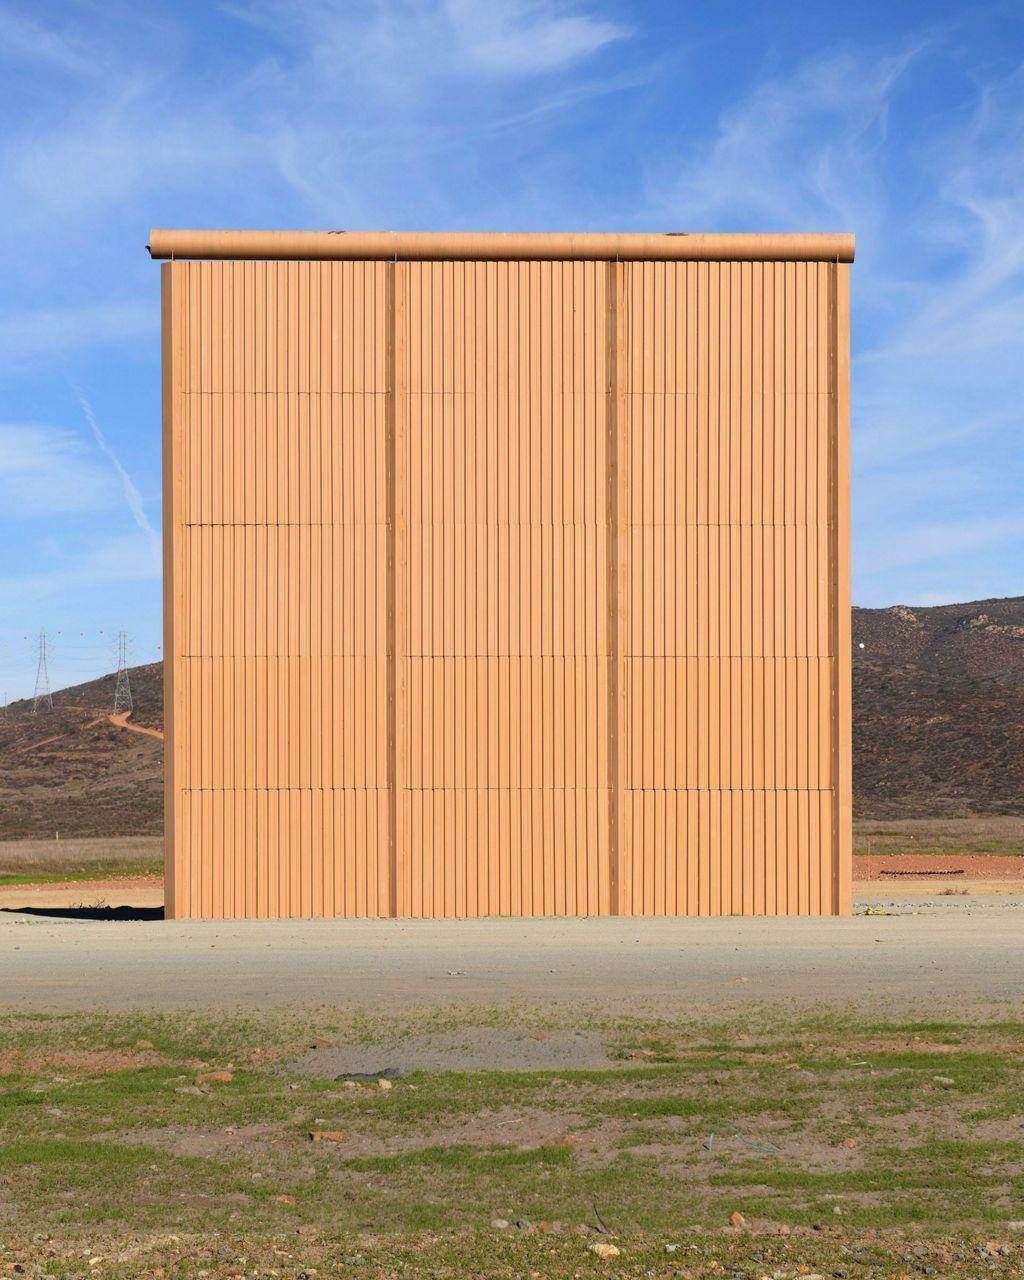 Ny 1 Weather >> AP PHOTOS: Wall prototypes sit on the US-Mexico border